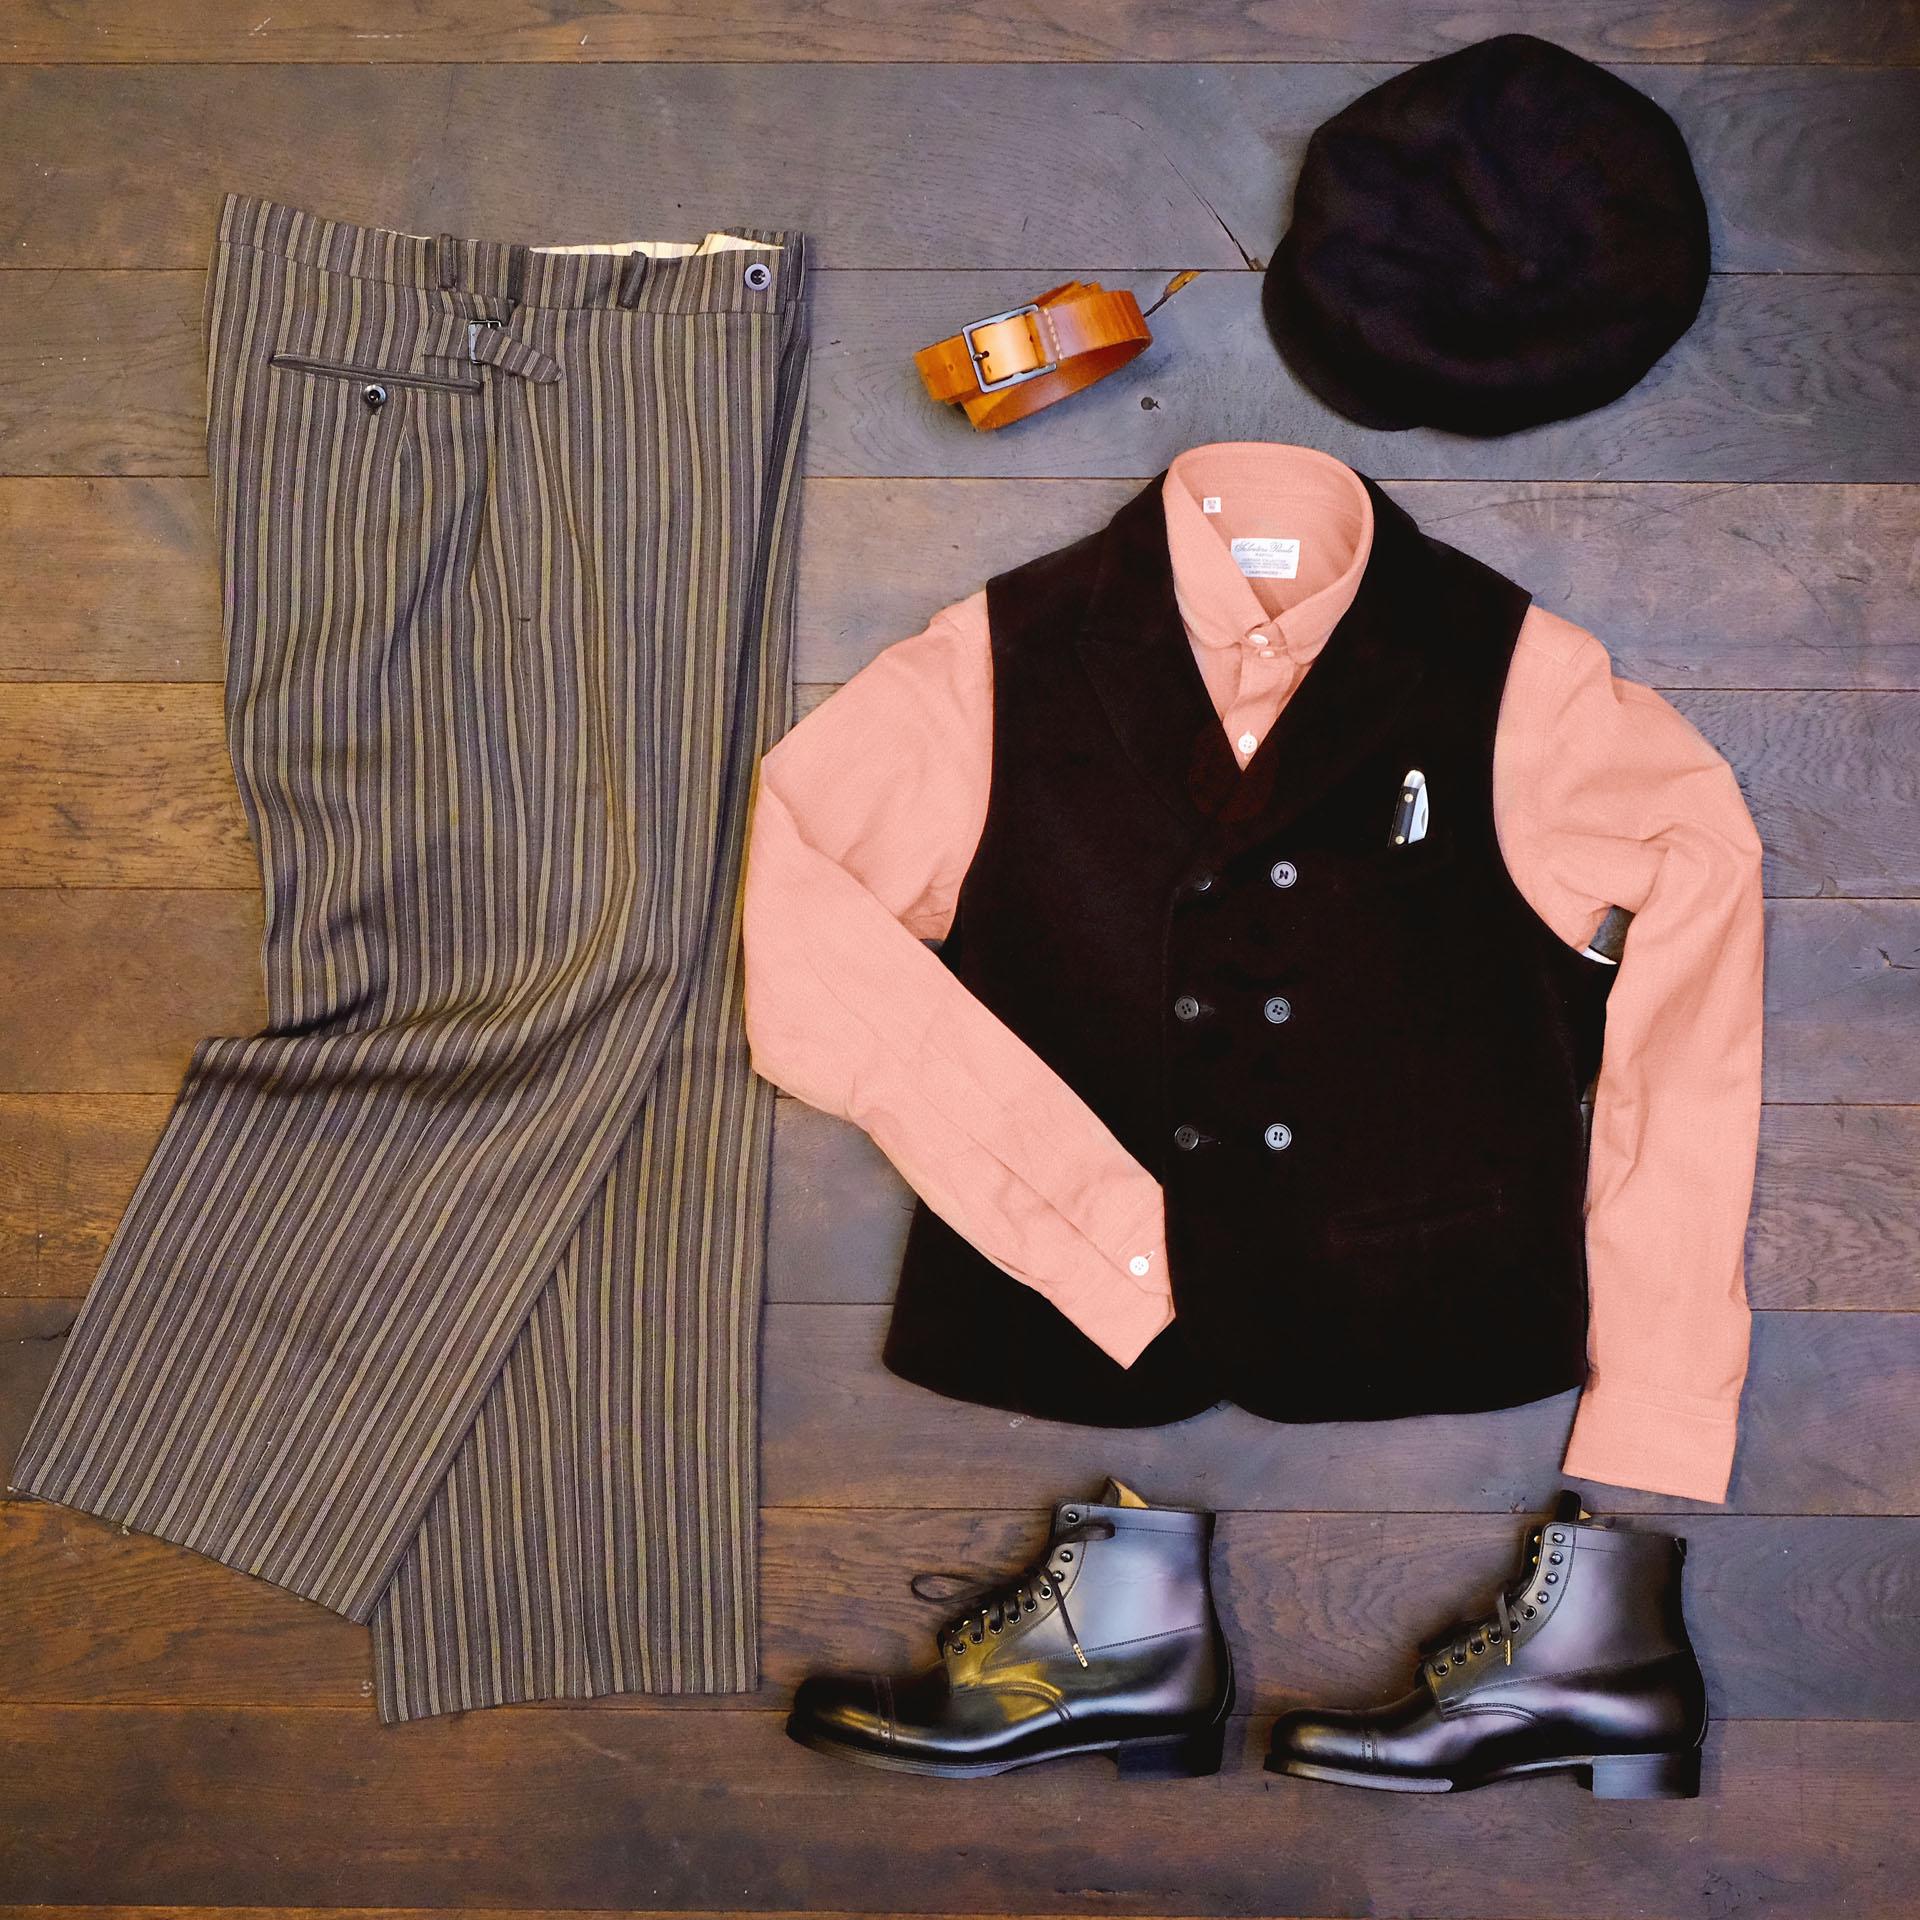 outfitderwoche-vintage-hose-stresemann-streifen-salvatorepiccolo-hemd-interbrigade-weste-moleskin-blacksign-stiefel-ca4la-newsboy-kappe-laguiole